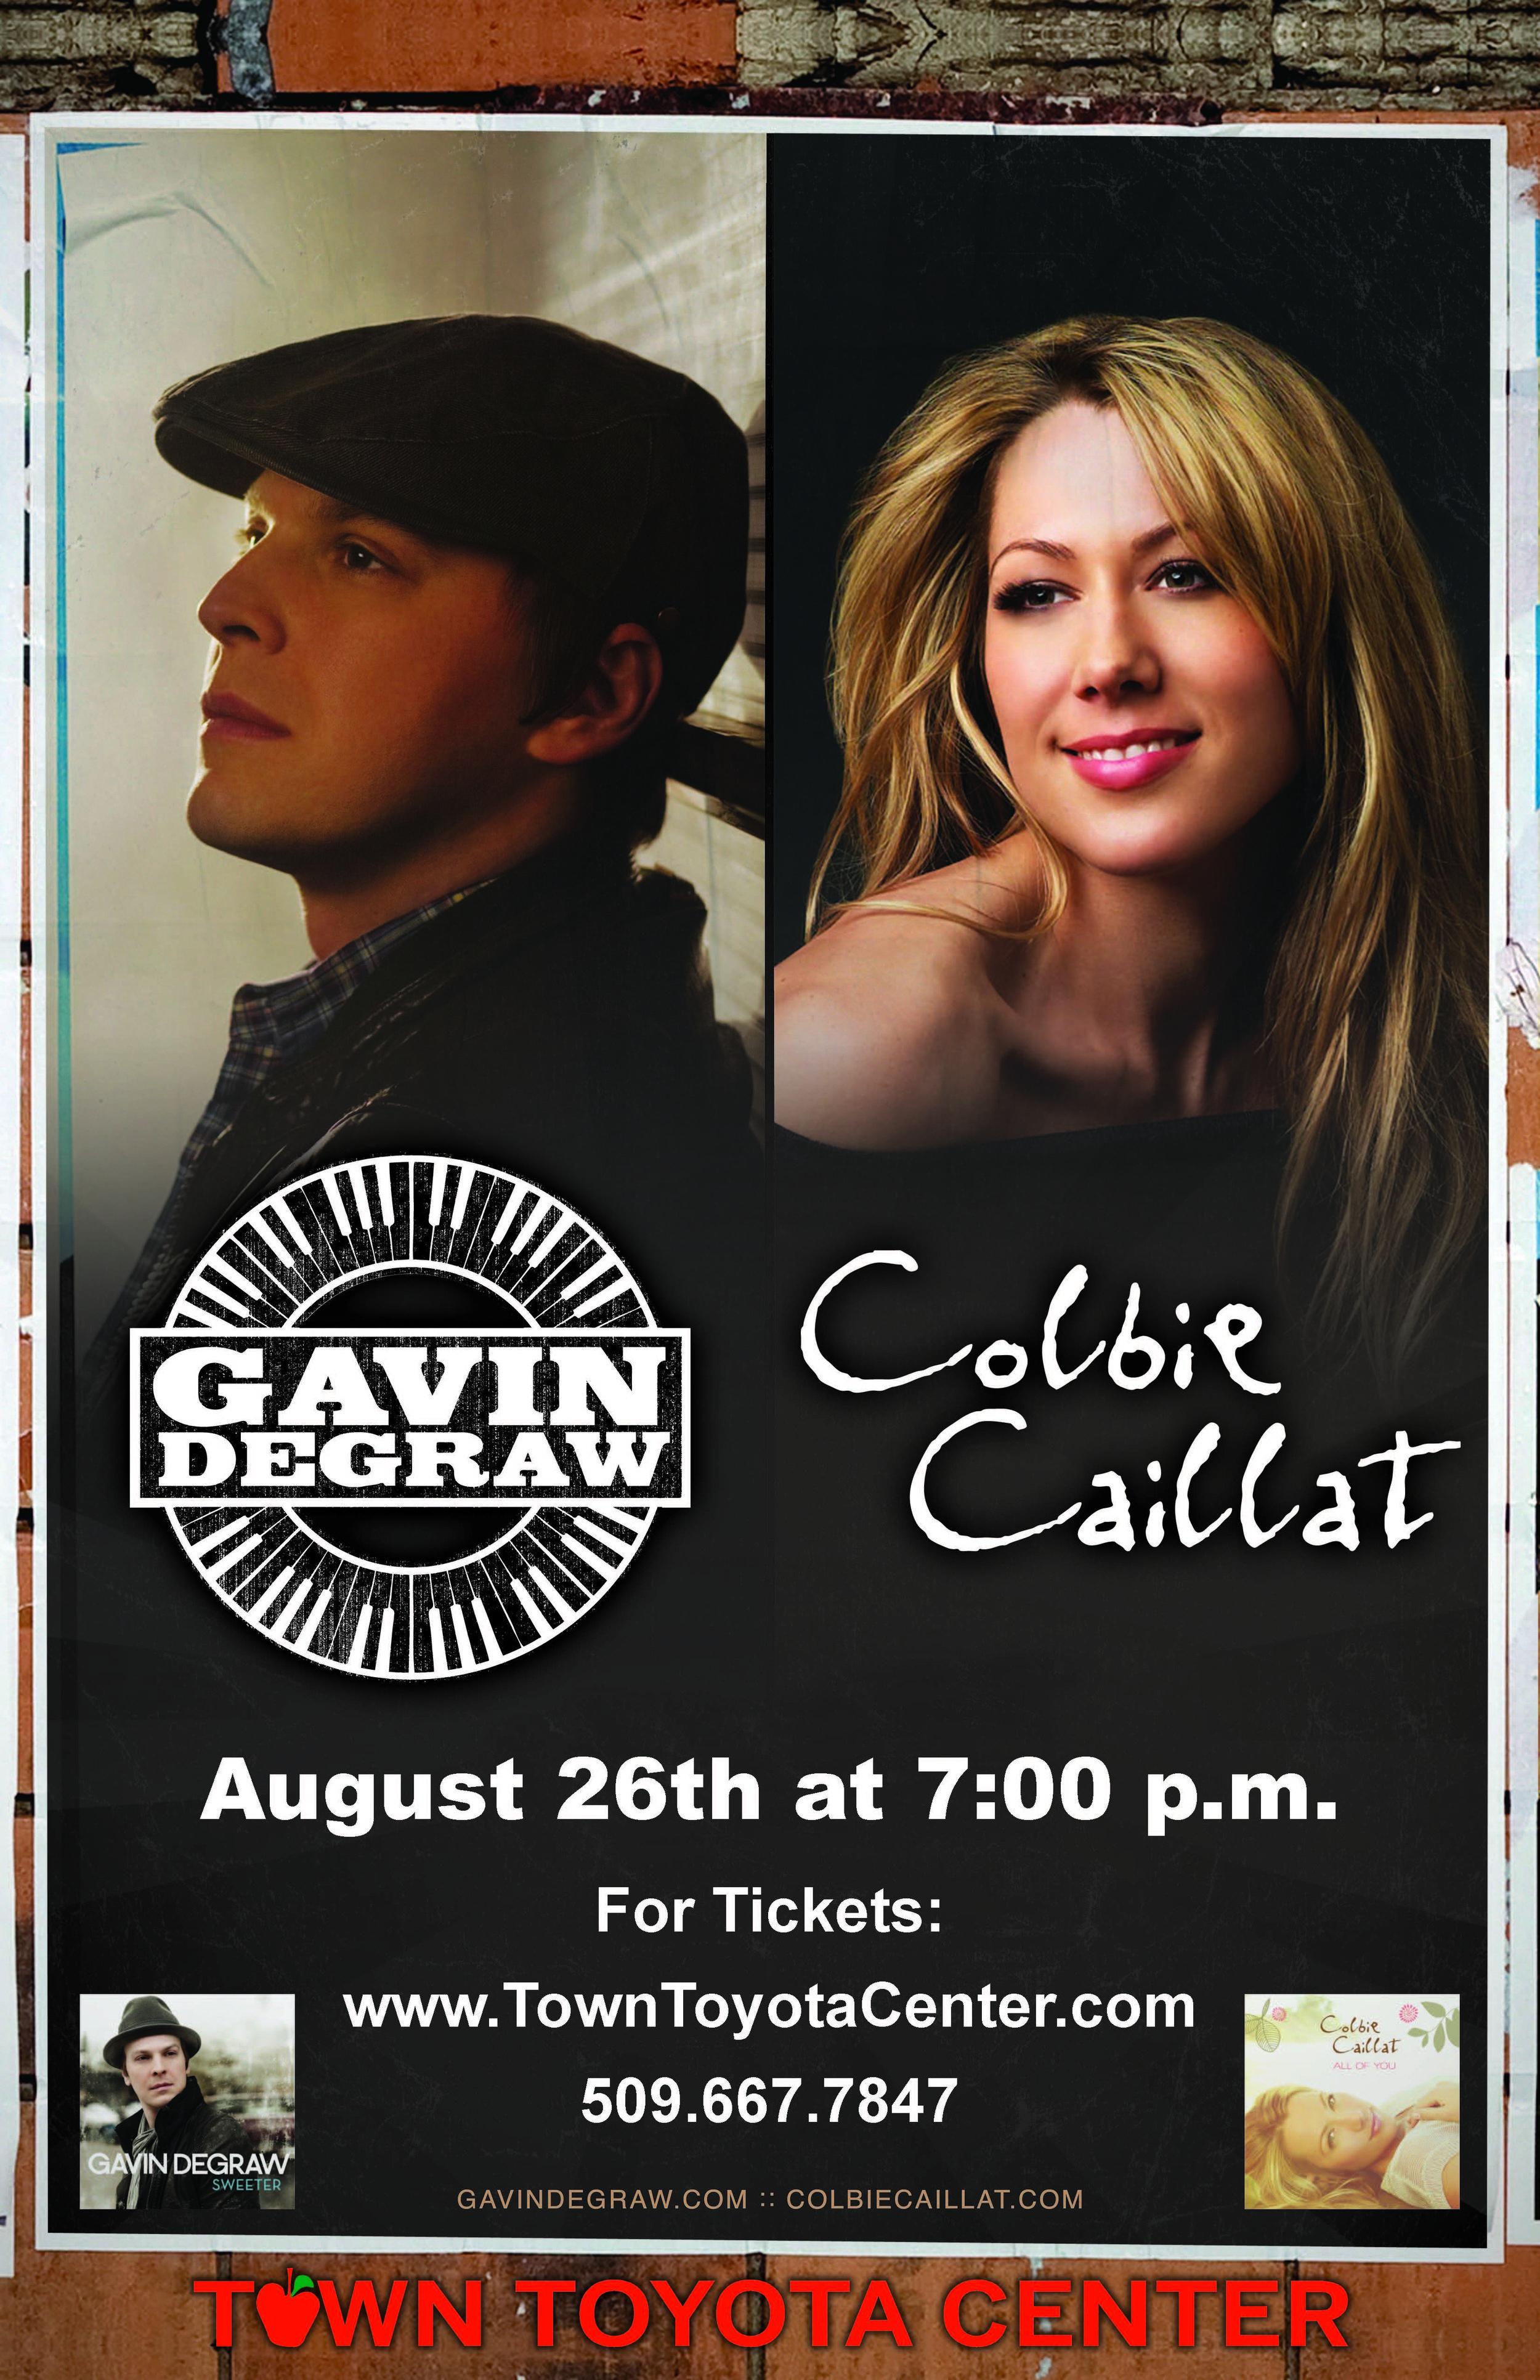 Gavin Degraw & Colbie Caillat Poster.jpg